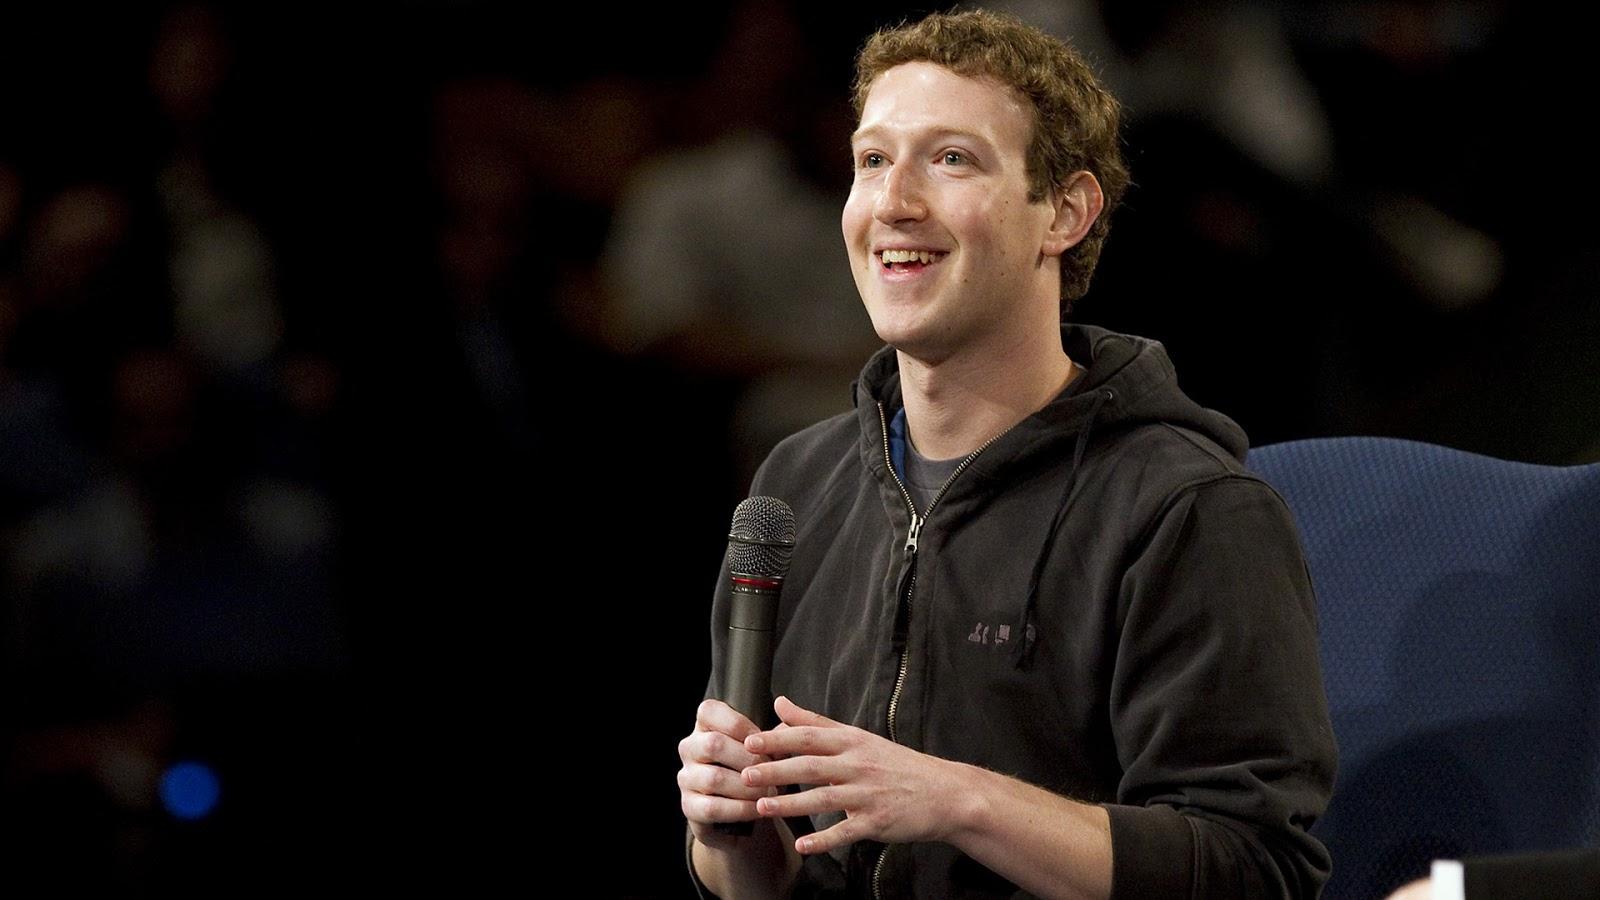 Mark Zuckerberg Wallpaper Photos 2014